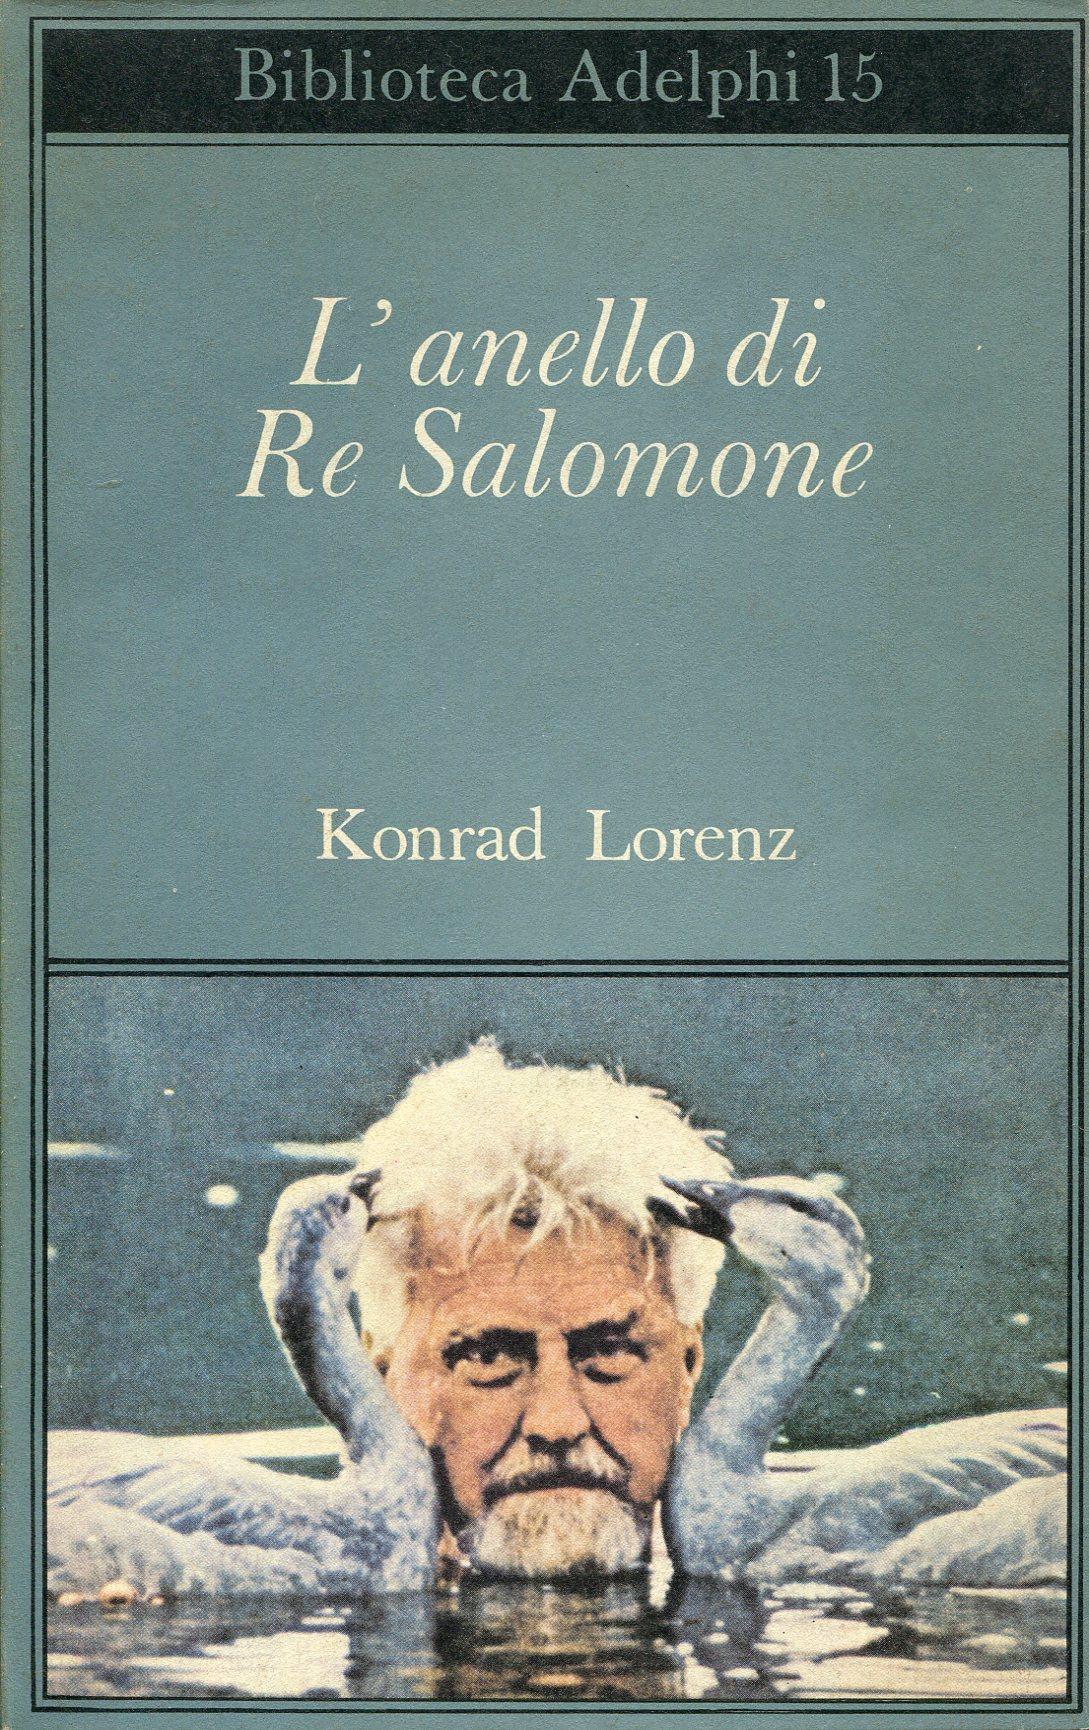 Konrad LORENZ L'ANELLO DI RE SALOMONE , Adelphi 2 (1990